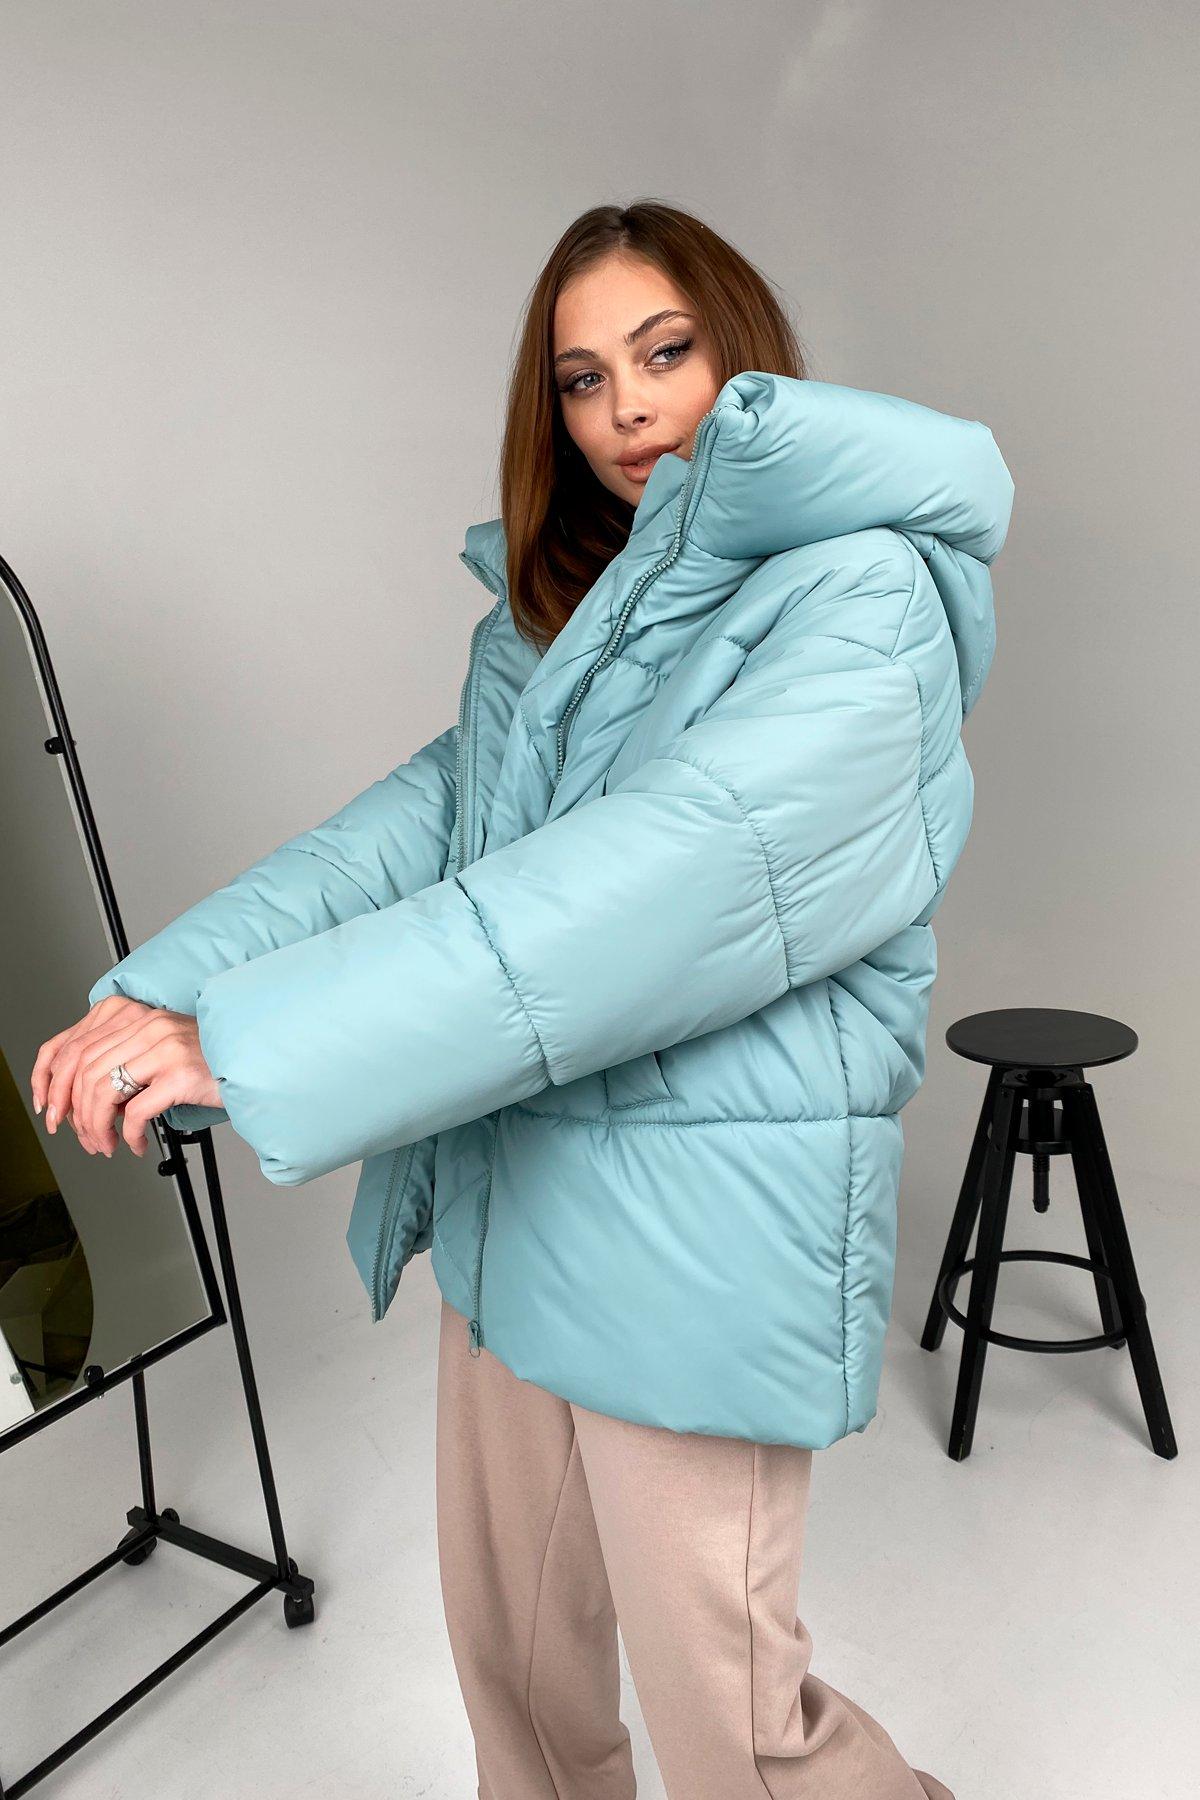 Овертайм  теплый пуховик из плащевой ткани 10243 АРТ. 46535 Цвет: Олива 756 - фото 6, интернет магазин tm-modus.ru